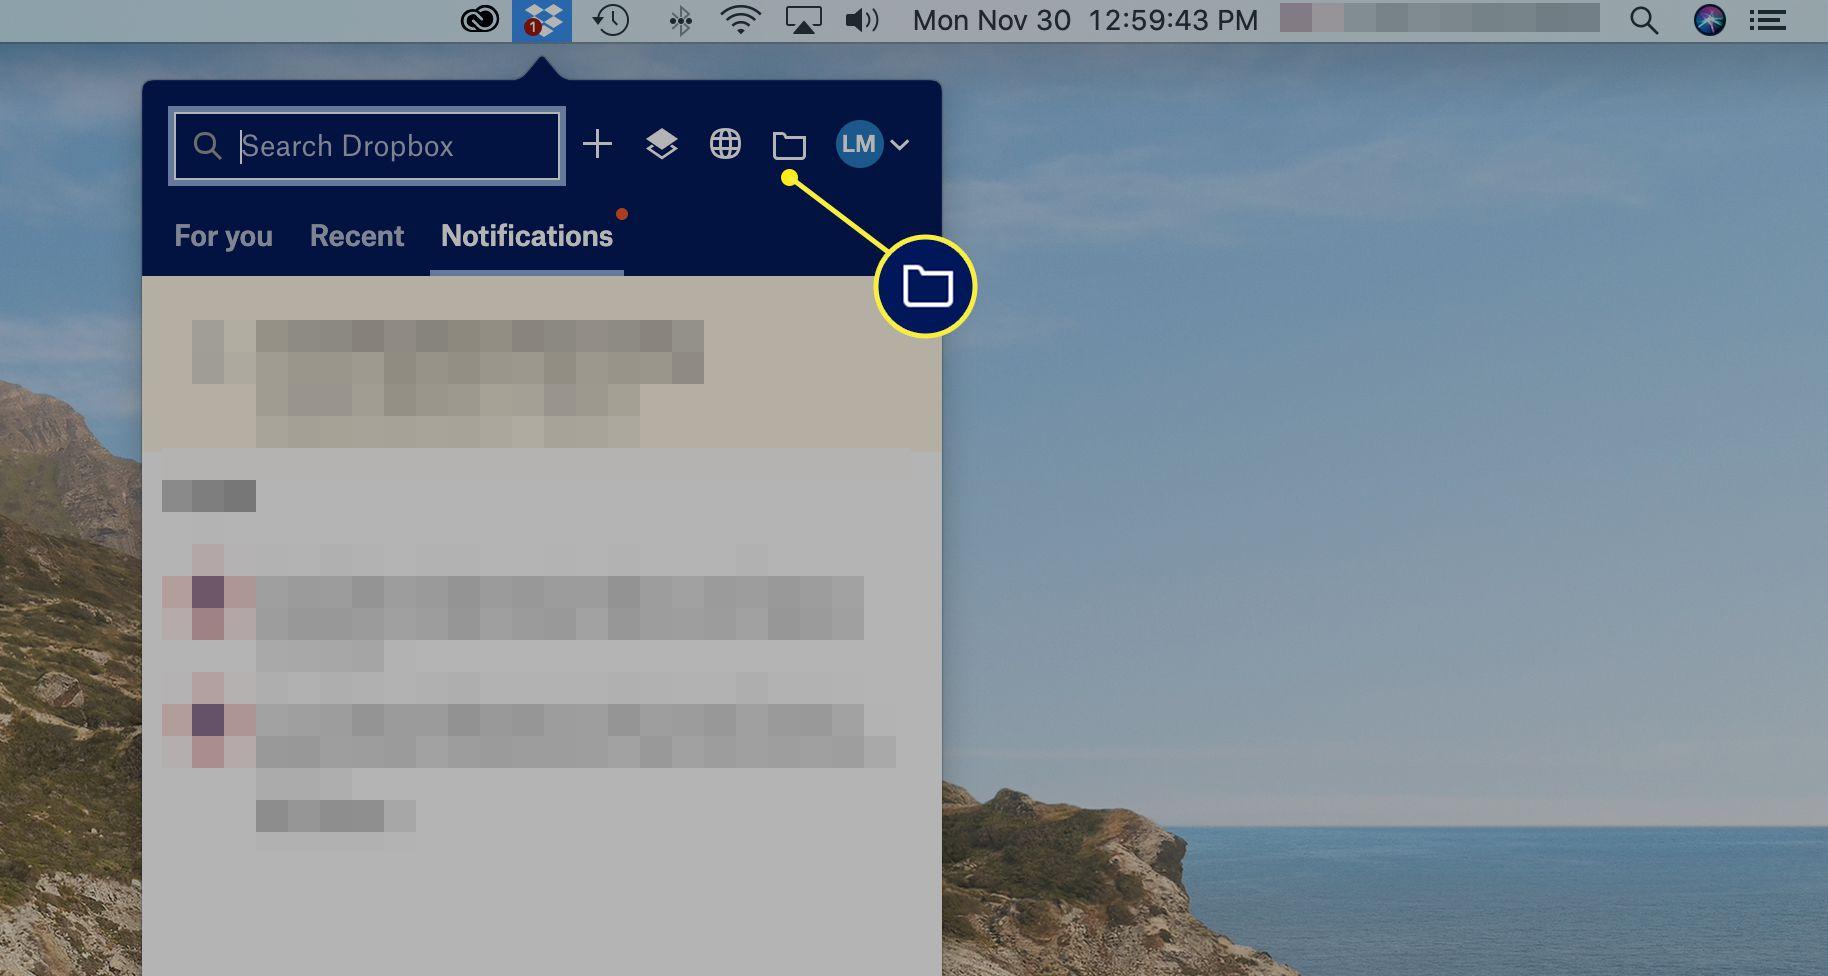 Folder selected in Dropbox screen